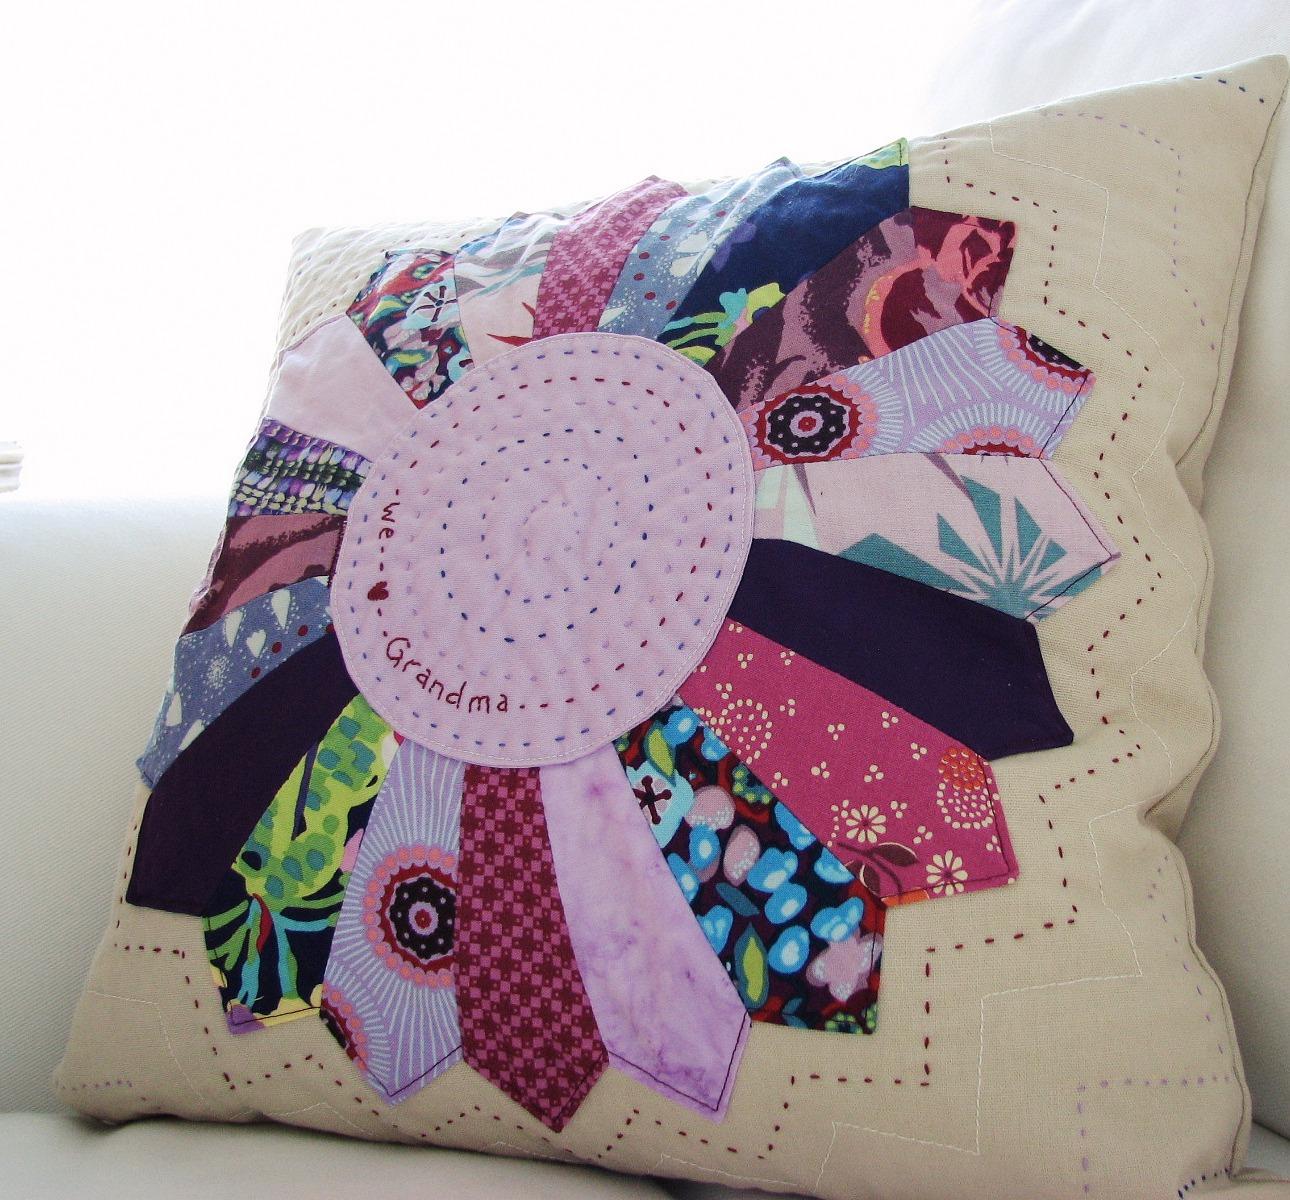 Blue Elephant Stitches: A Pillow for Grandma